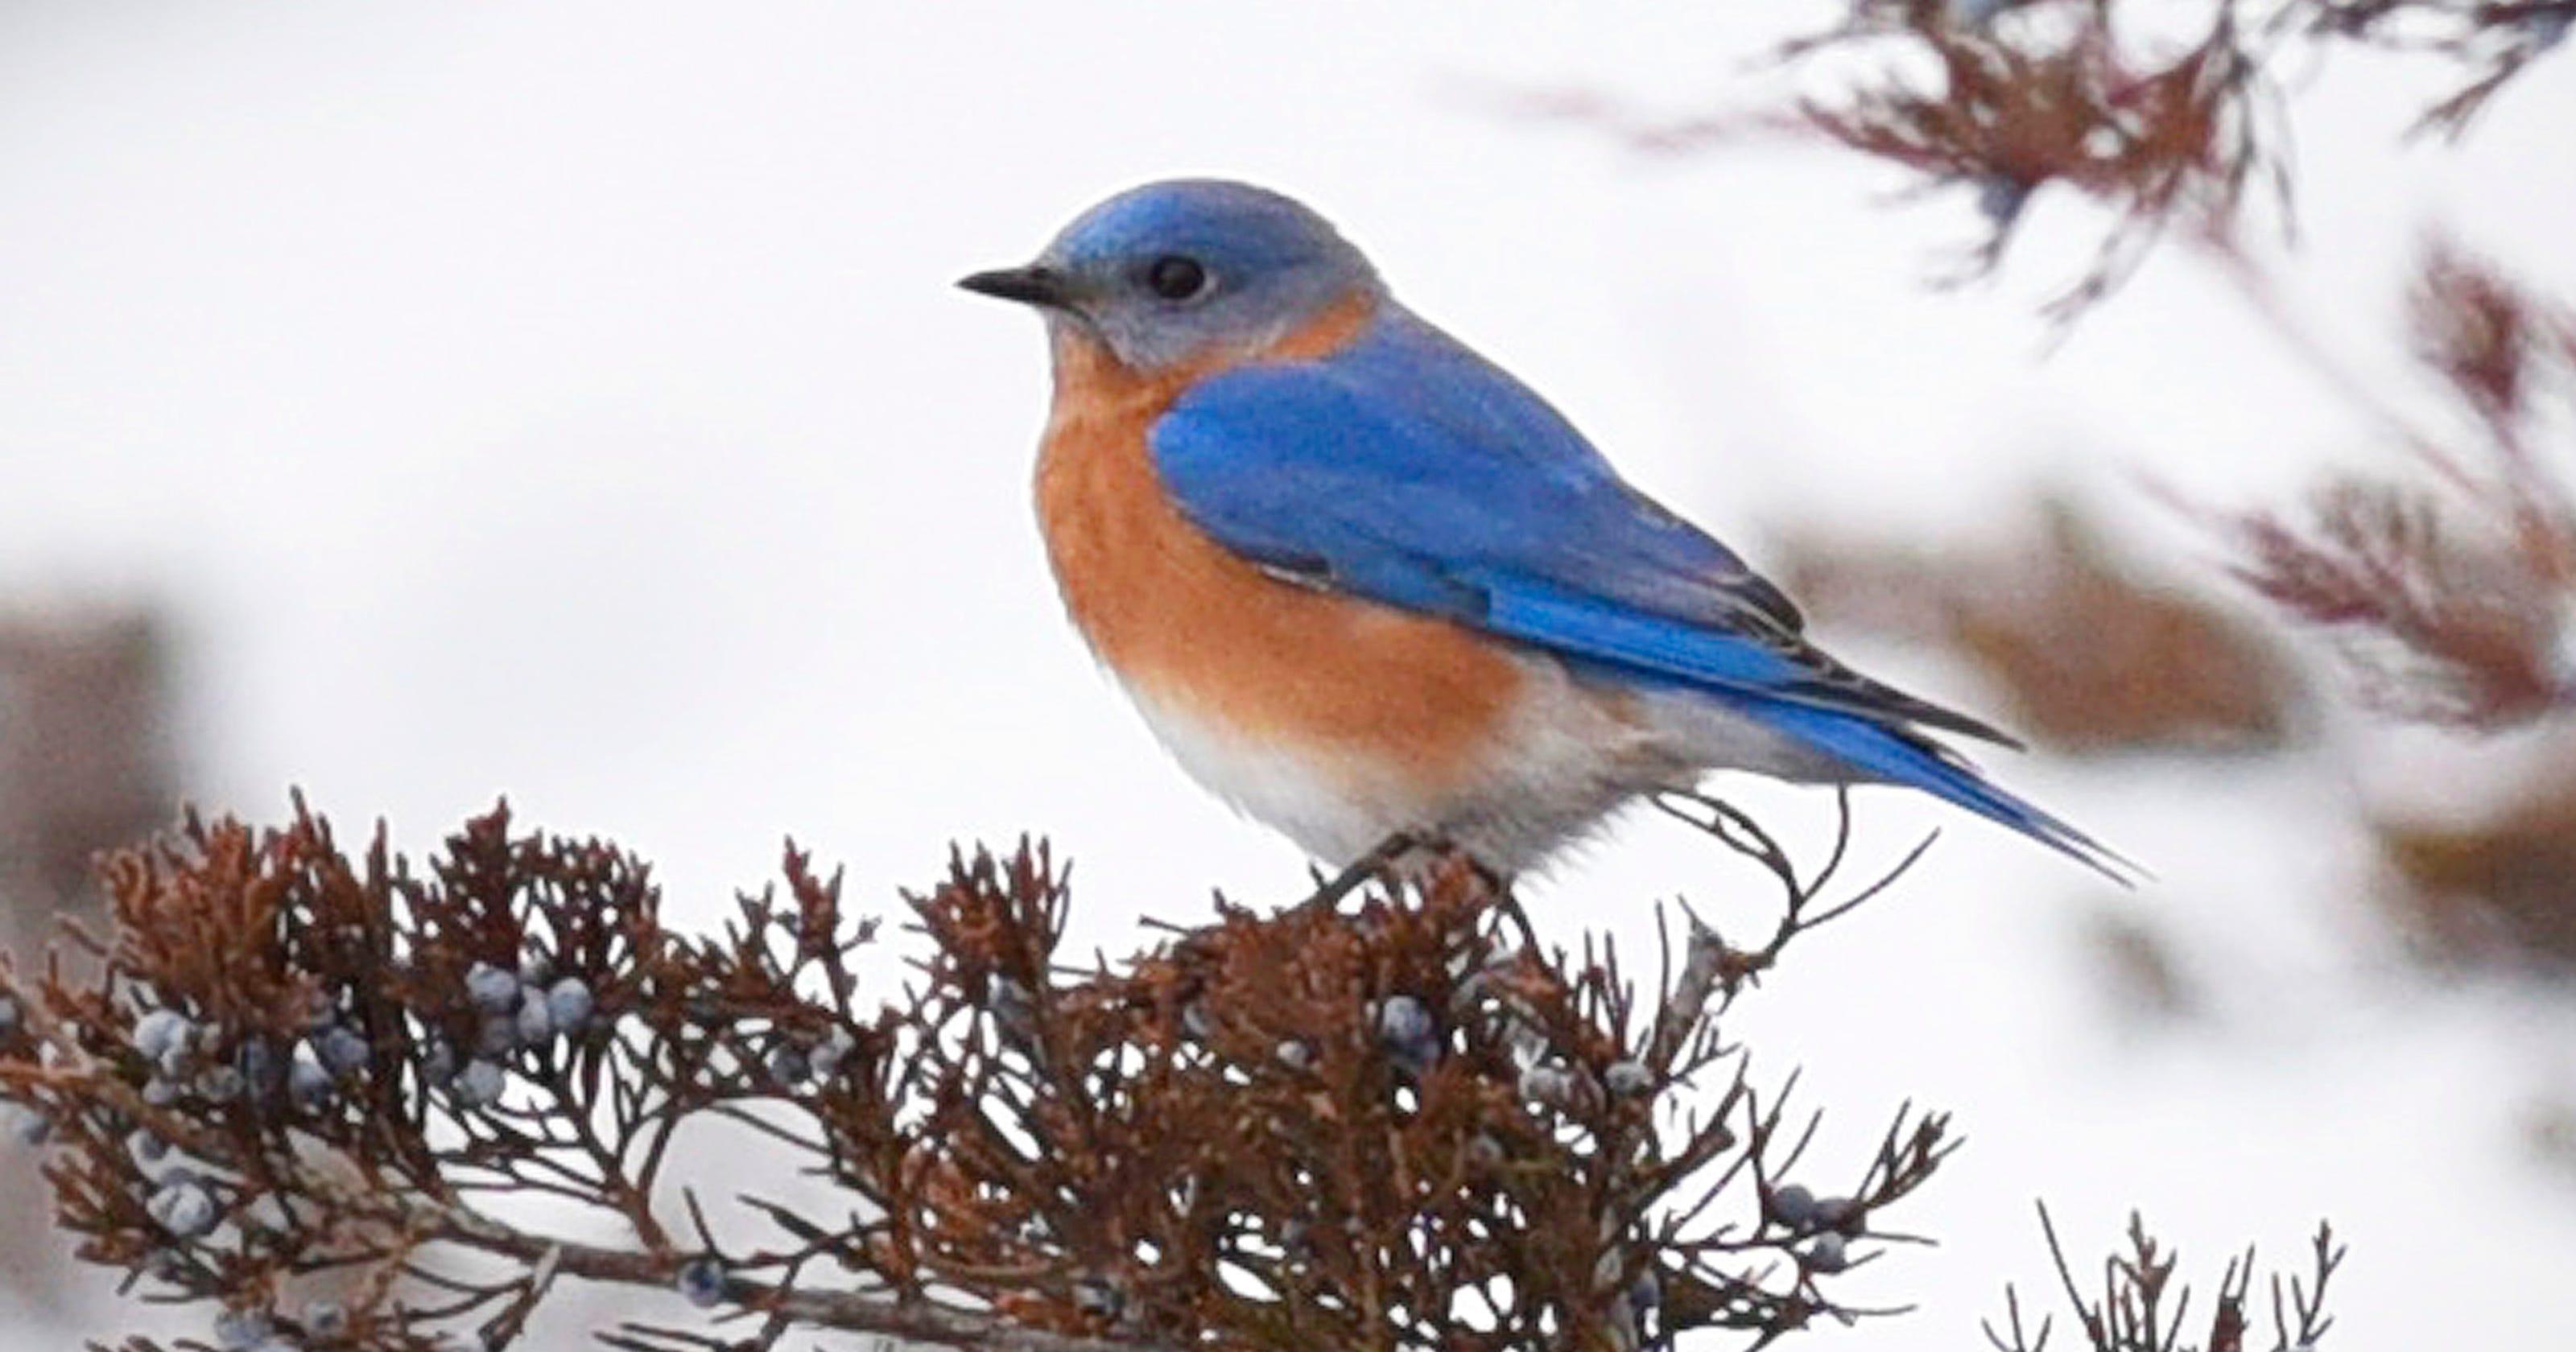 Winter birding: Seeking species off the beaten path